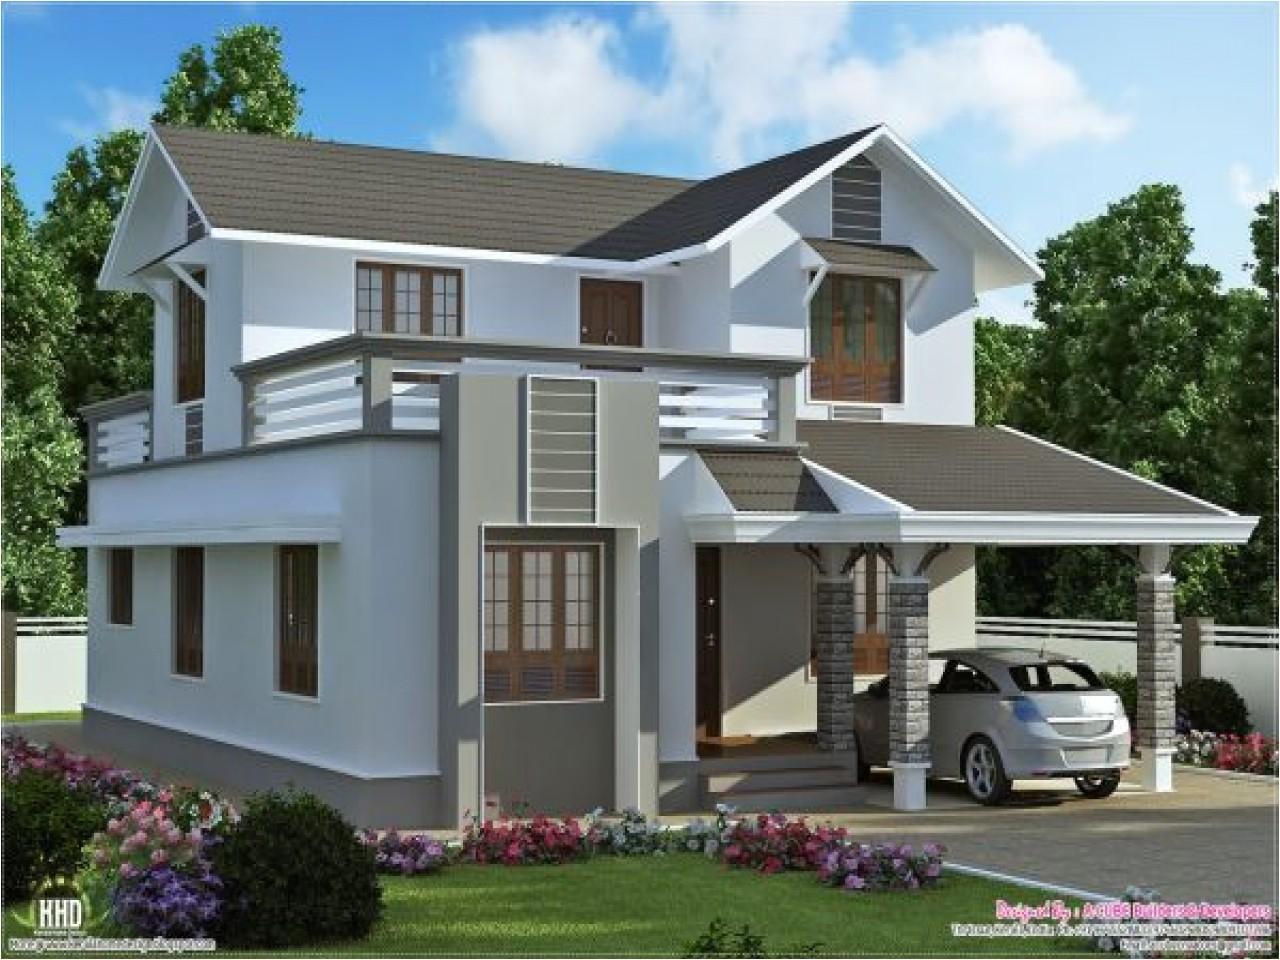 7a0a9f8a55364e1a residential 2 storey house plan 2 storey house design